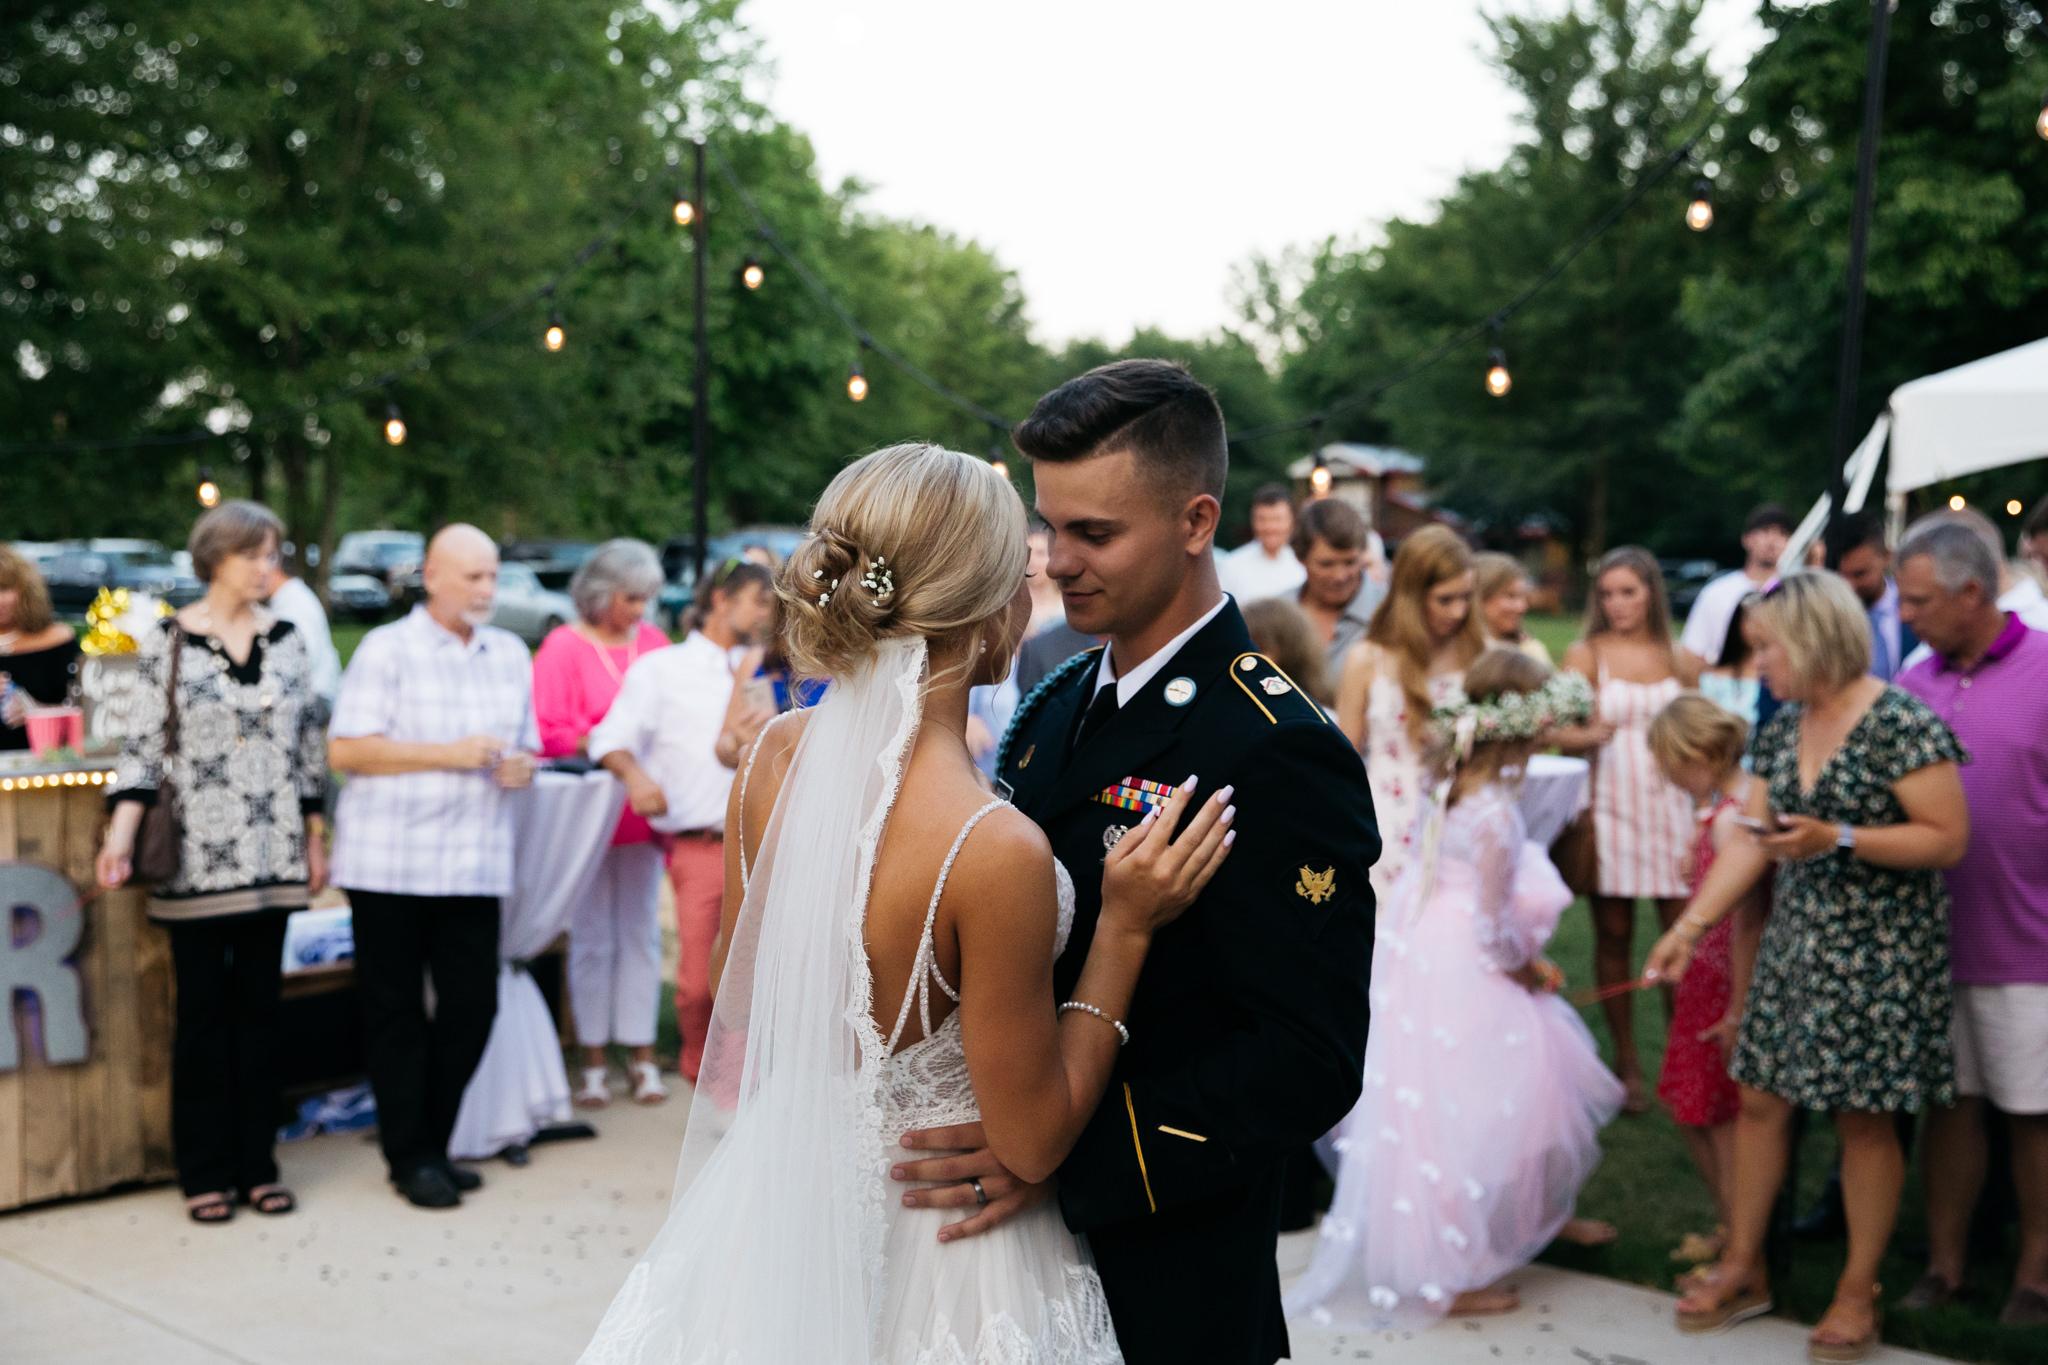 backyard-wedding-thewarmtharoundyou-lexy-branson-16.jpg